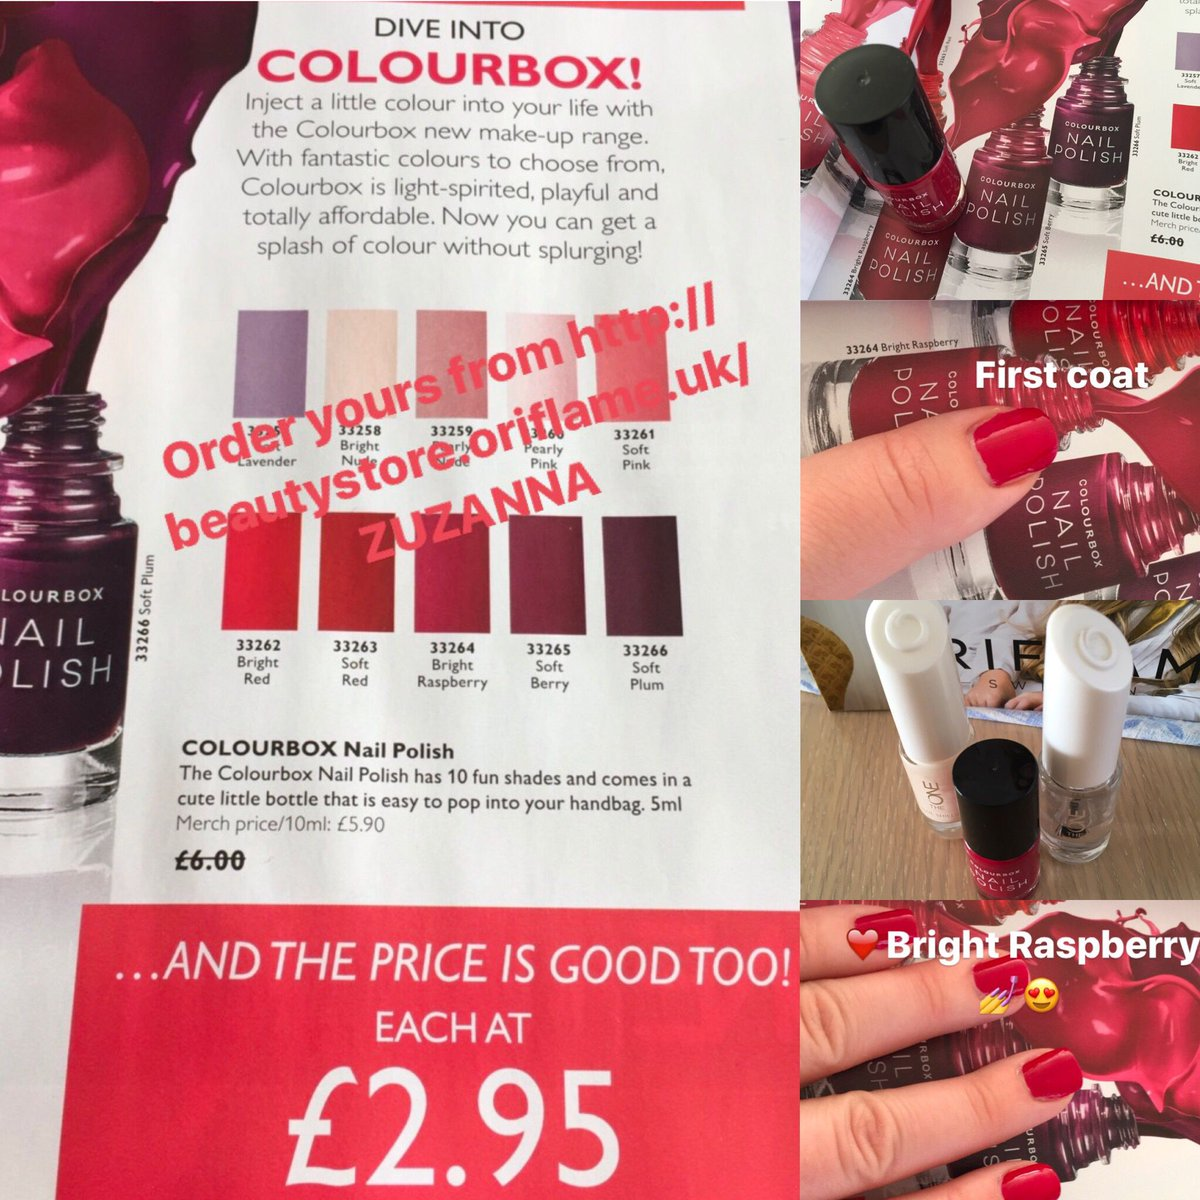 Zuzanna Zeli On Twitter Colourbox Nail Polish Bright Raspberry Https T Co Ridgoq1krw Oriflame Oriflame50 Naturalcosmetics Nails Nailart Wowdeal Loveit Https T Co Kfjmcbrjmo